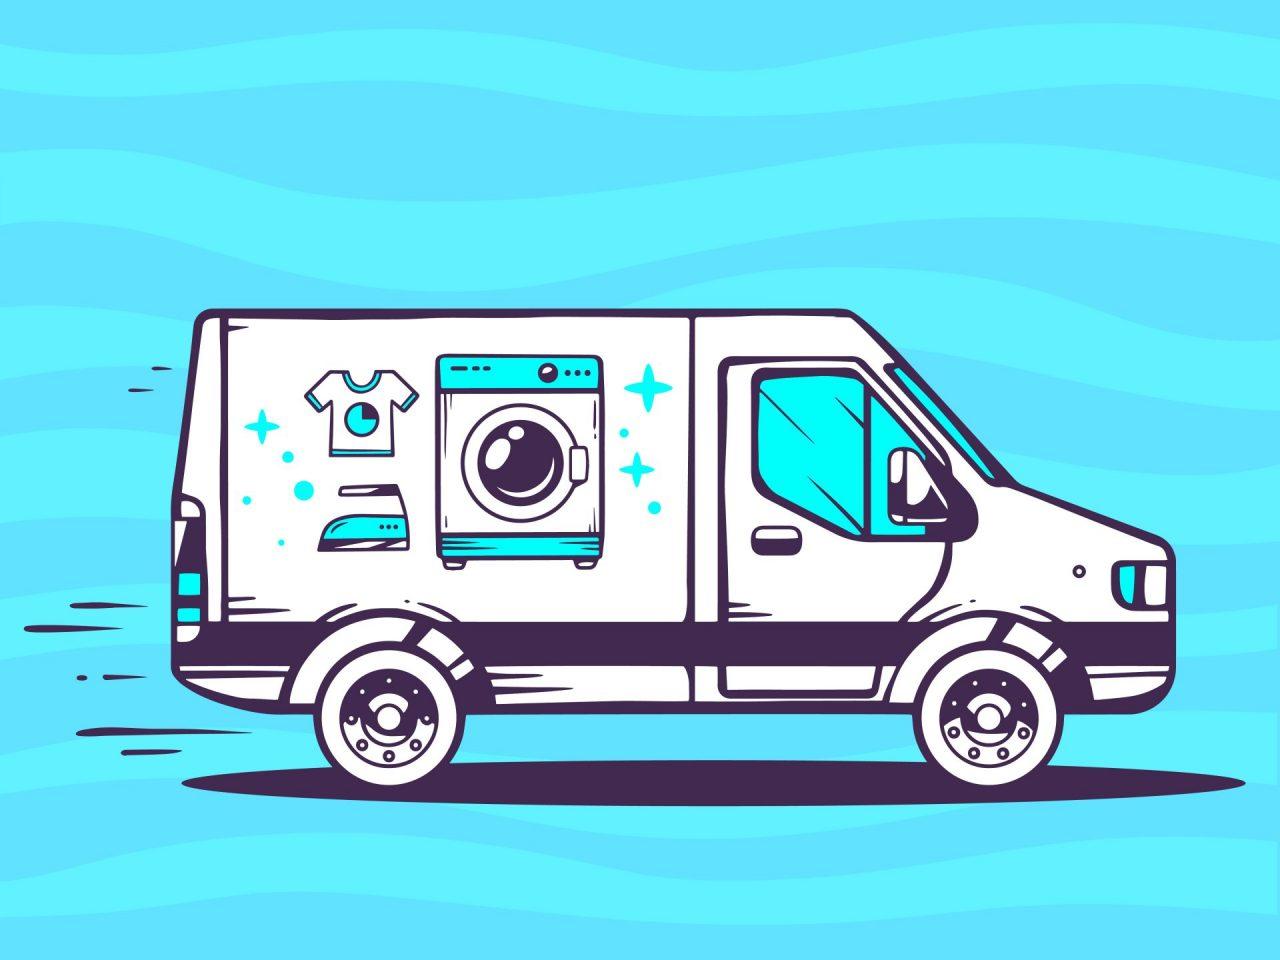 https://24hvirtual.com/wp-content/uploads/2021/10/Laundry-1280x960.jpg